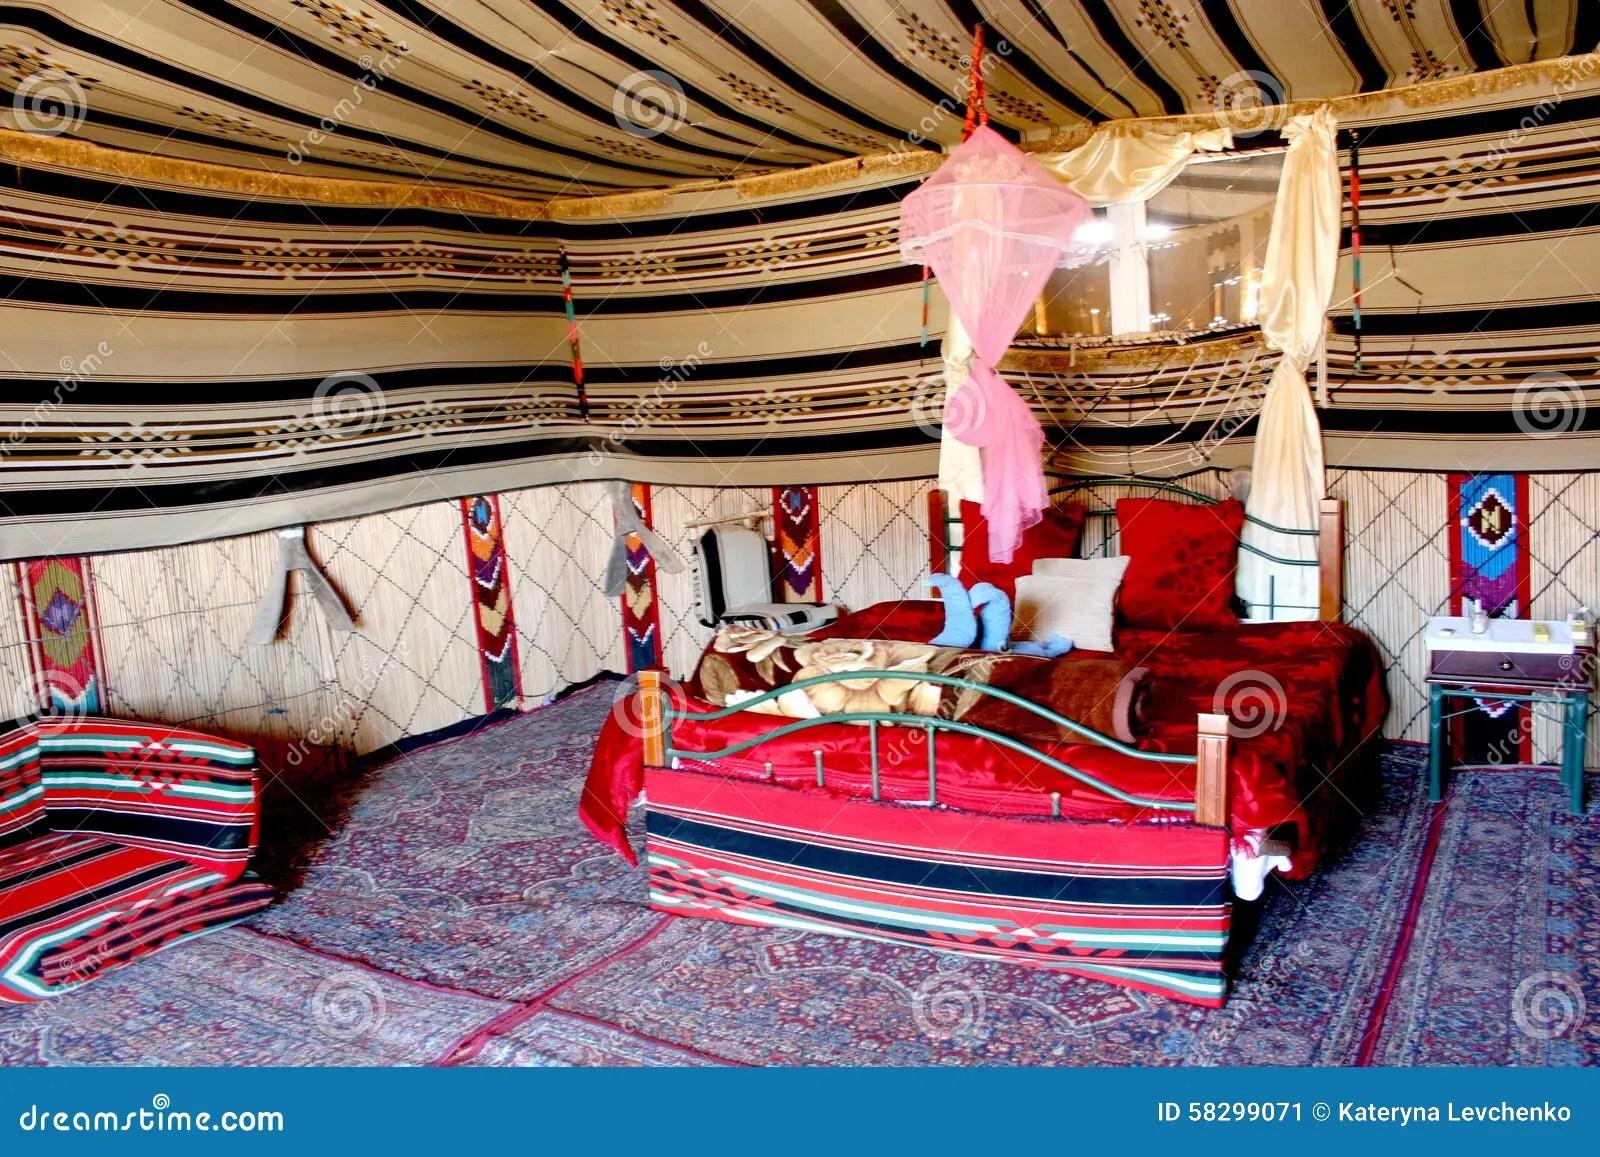 petra sofa bed furniture village most durable brands 2018 bedouin camp resort near jordan editorial photo